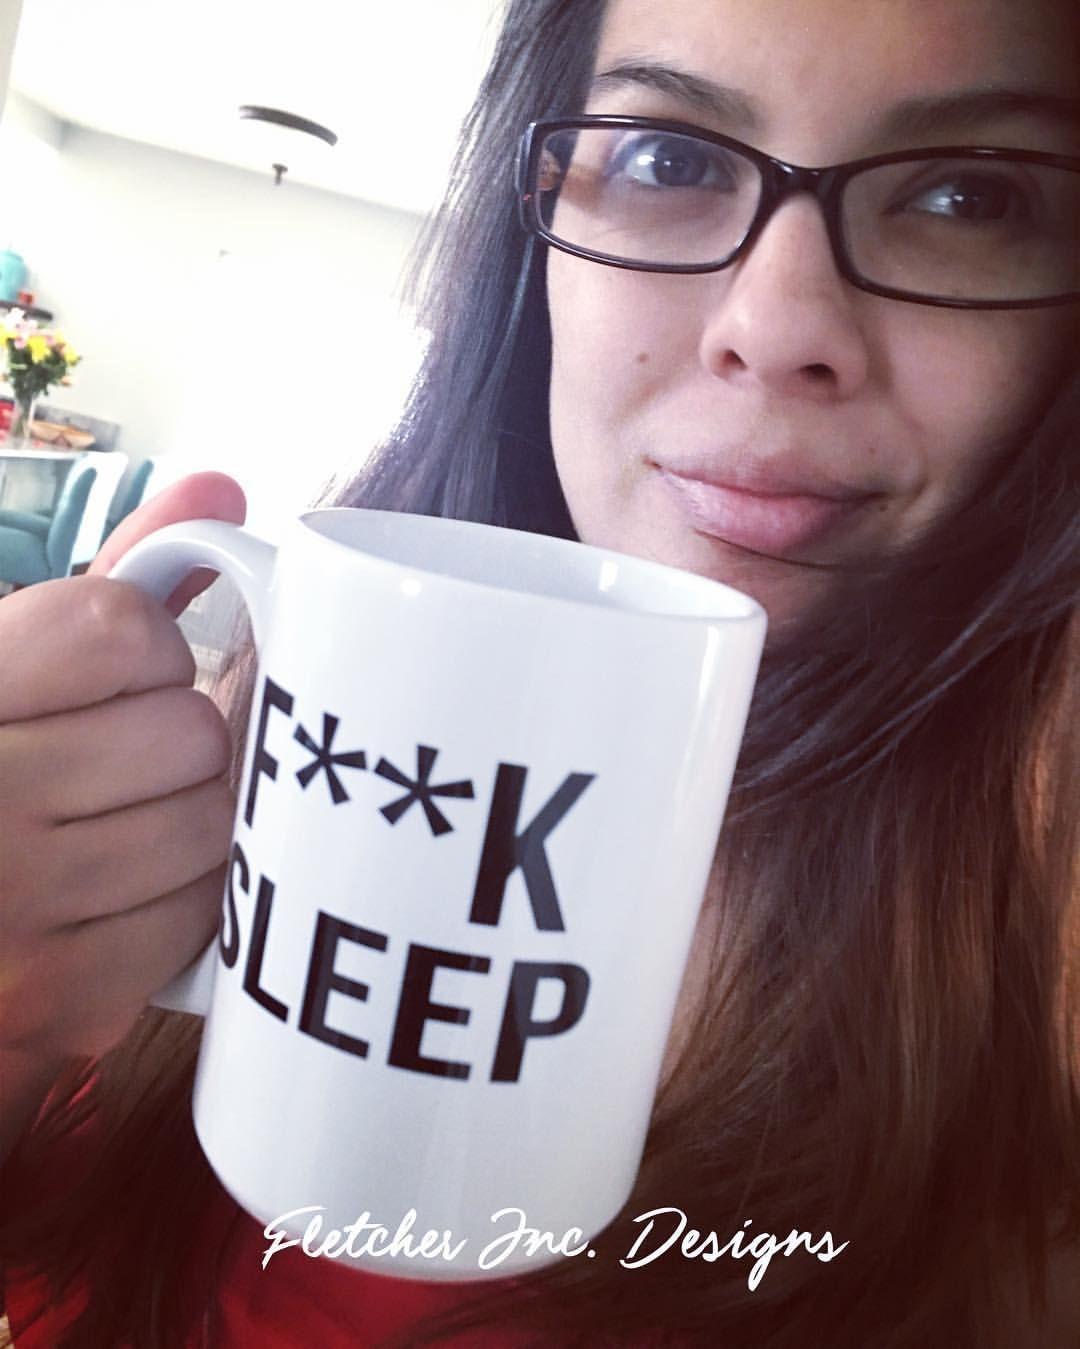 "34 Likes, 7 Comments - Fletcher Inc. Designs (@fletcherinc_designs) on Instagram: ""#teamnosleep #newborn #momlife #breasfeeding #CantBelieveImAMommy .... #fucksleep #coffee #fitmom…"""